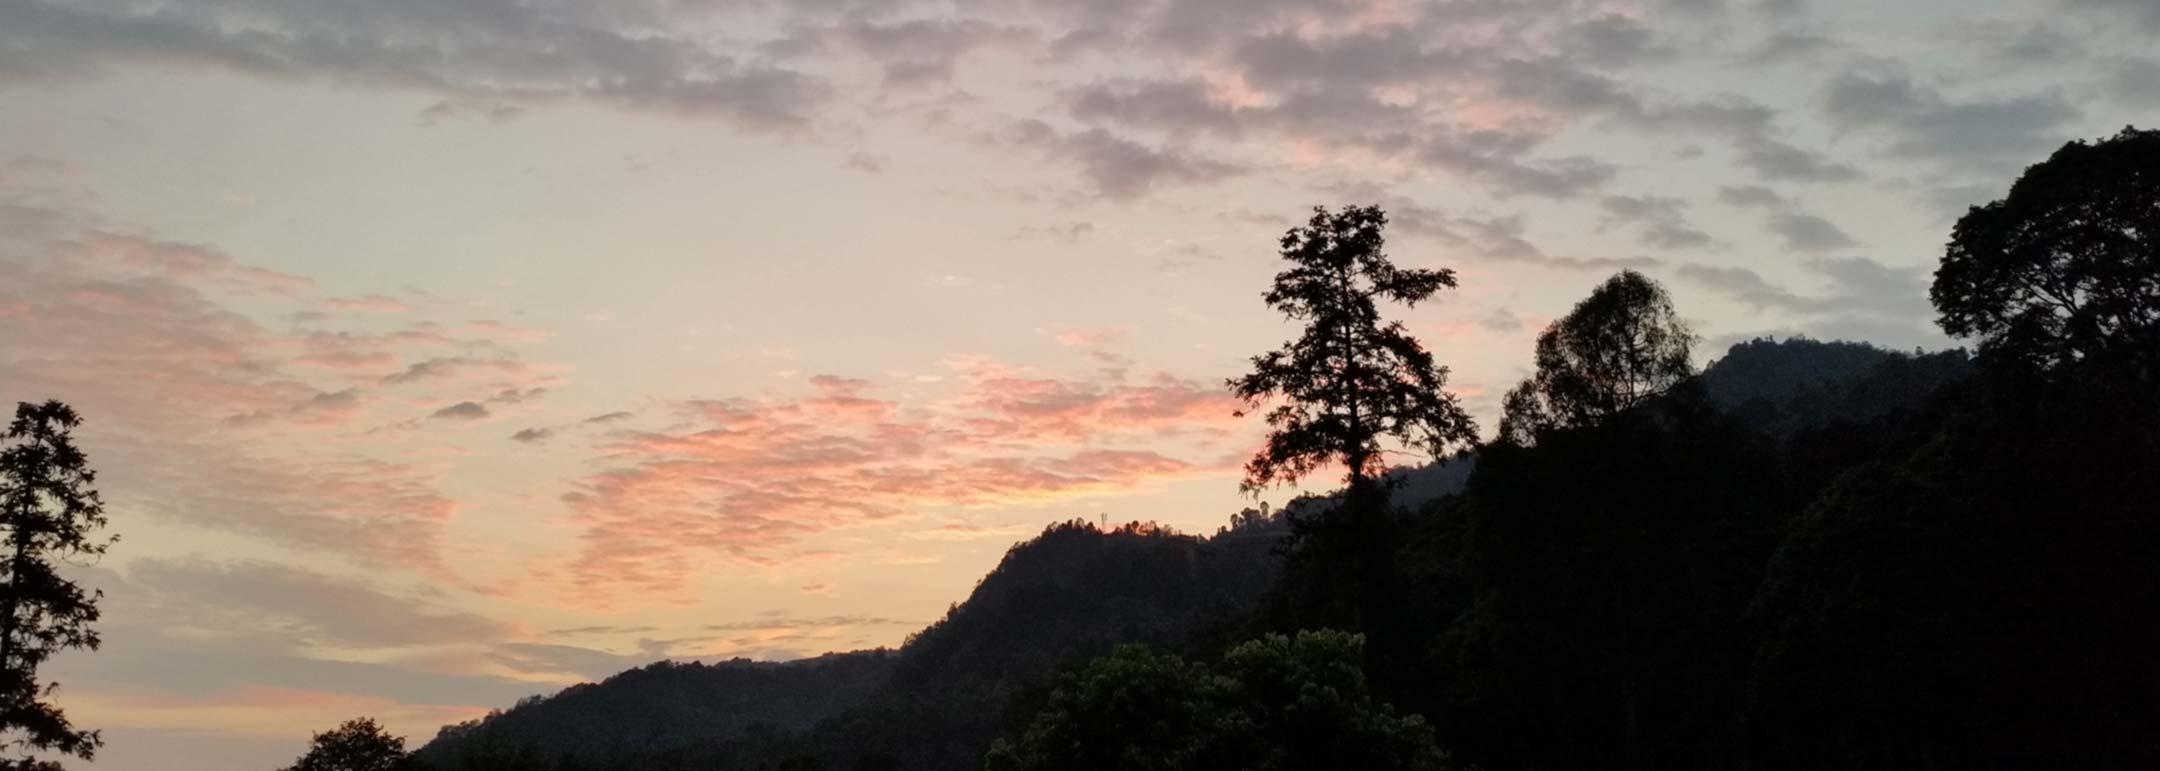 Spiritual Development at Sunrise at Emei Mountain